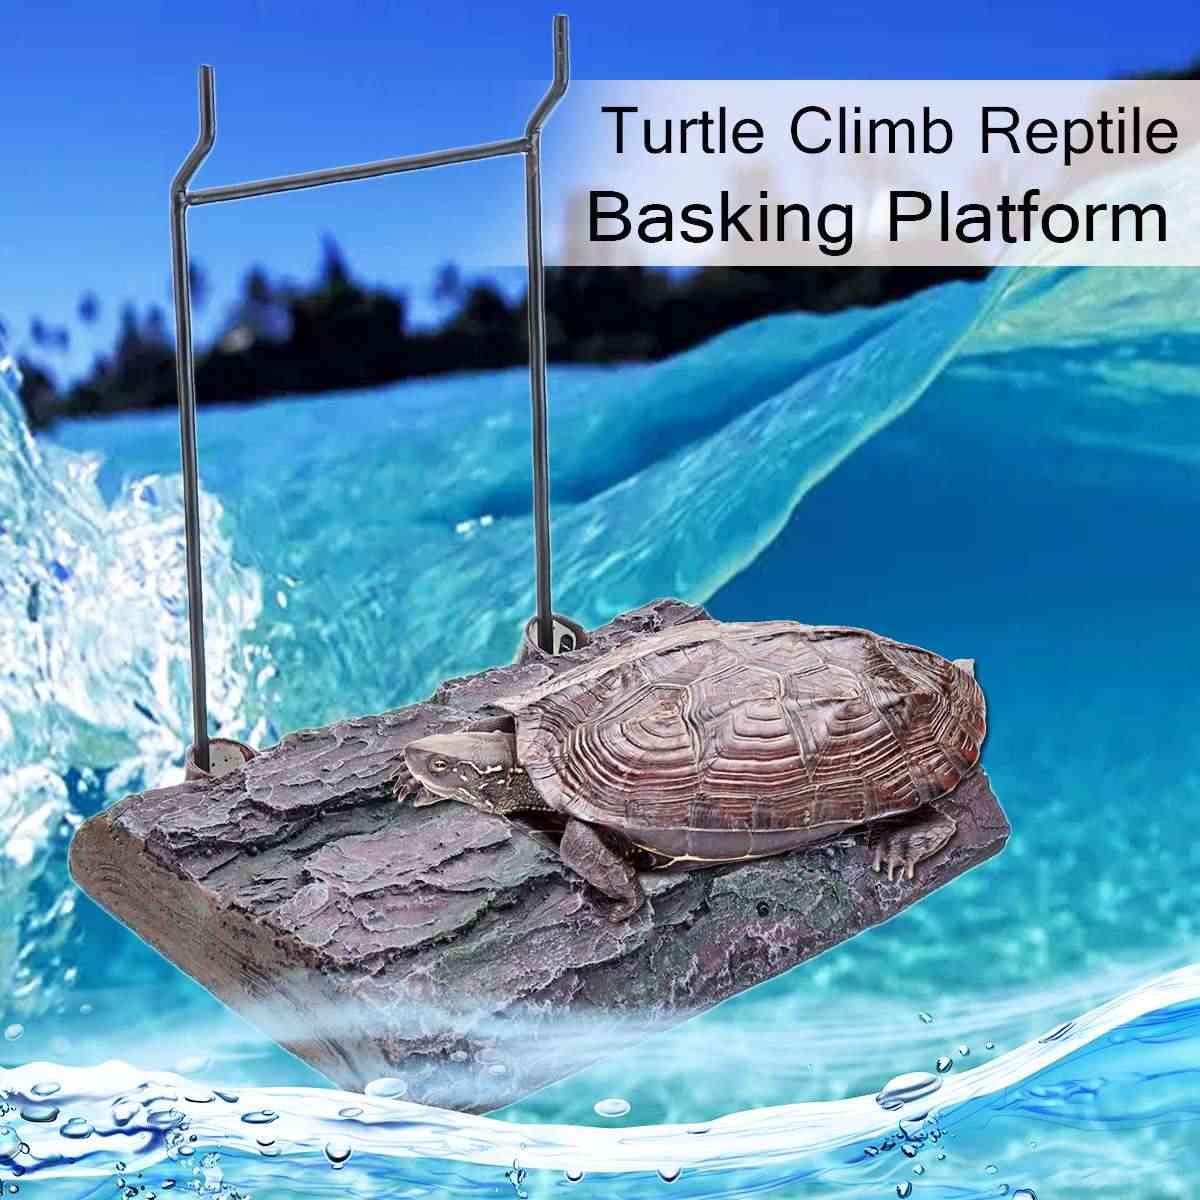 Aquarium Turtle Bask Terrace Island Platform Tank Reptile Dock Decor Aquarium Ornaments Tank Accessory